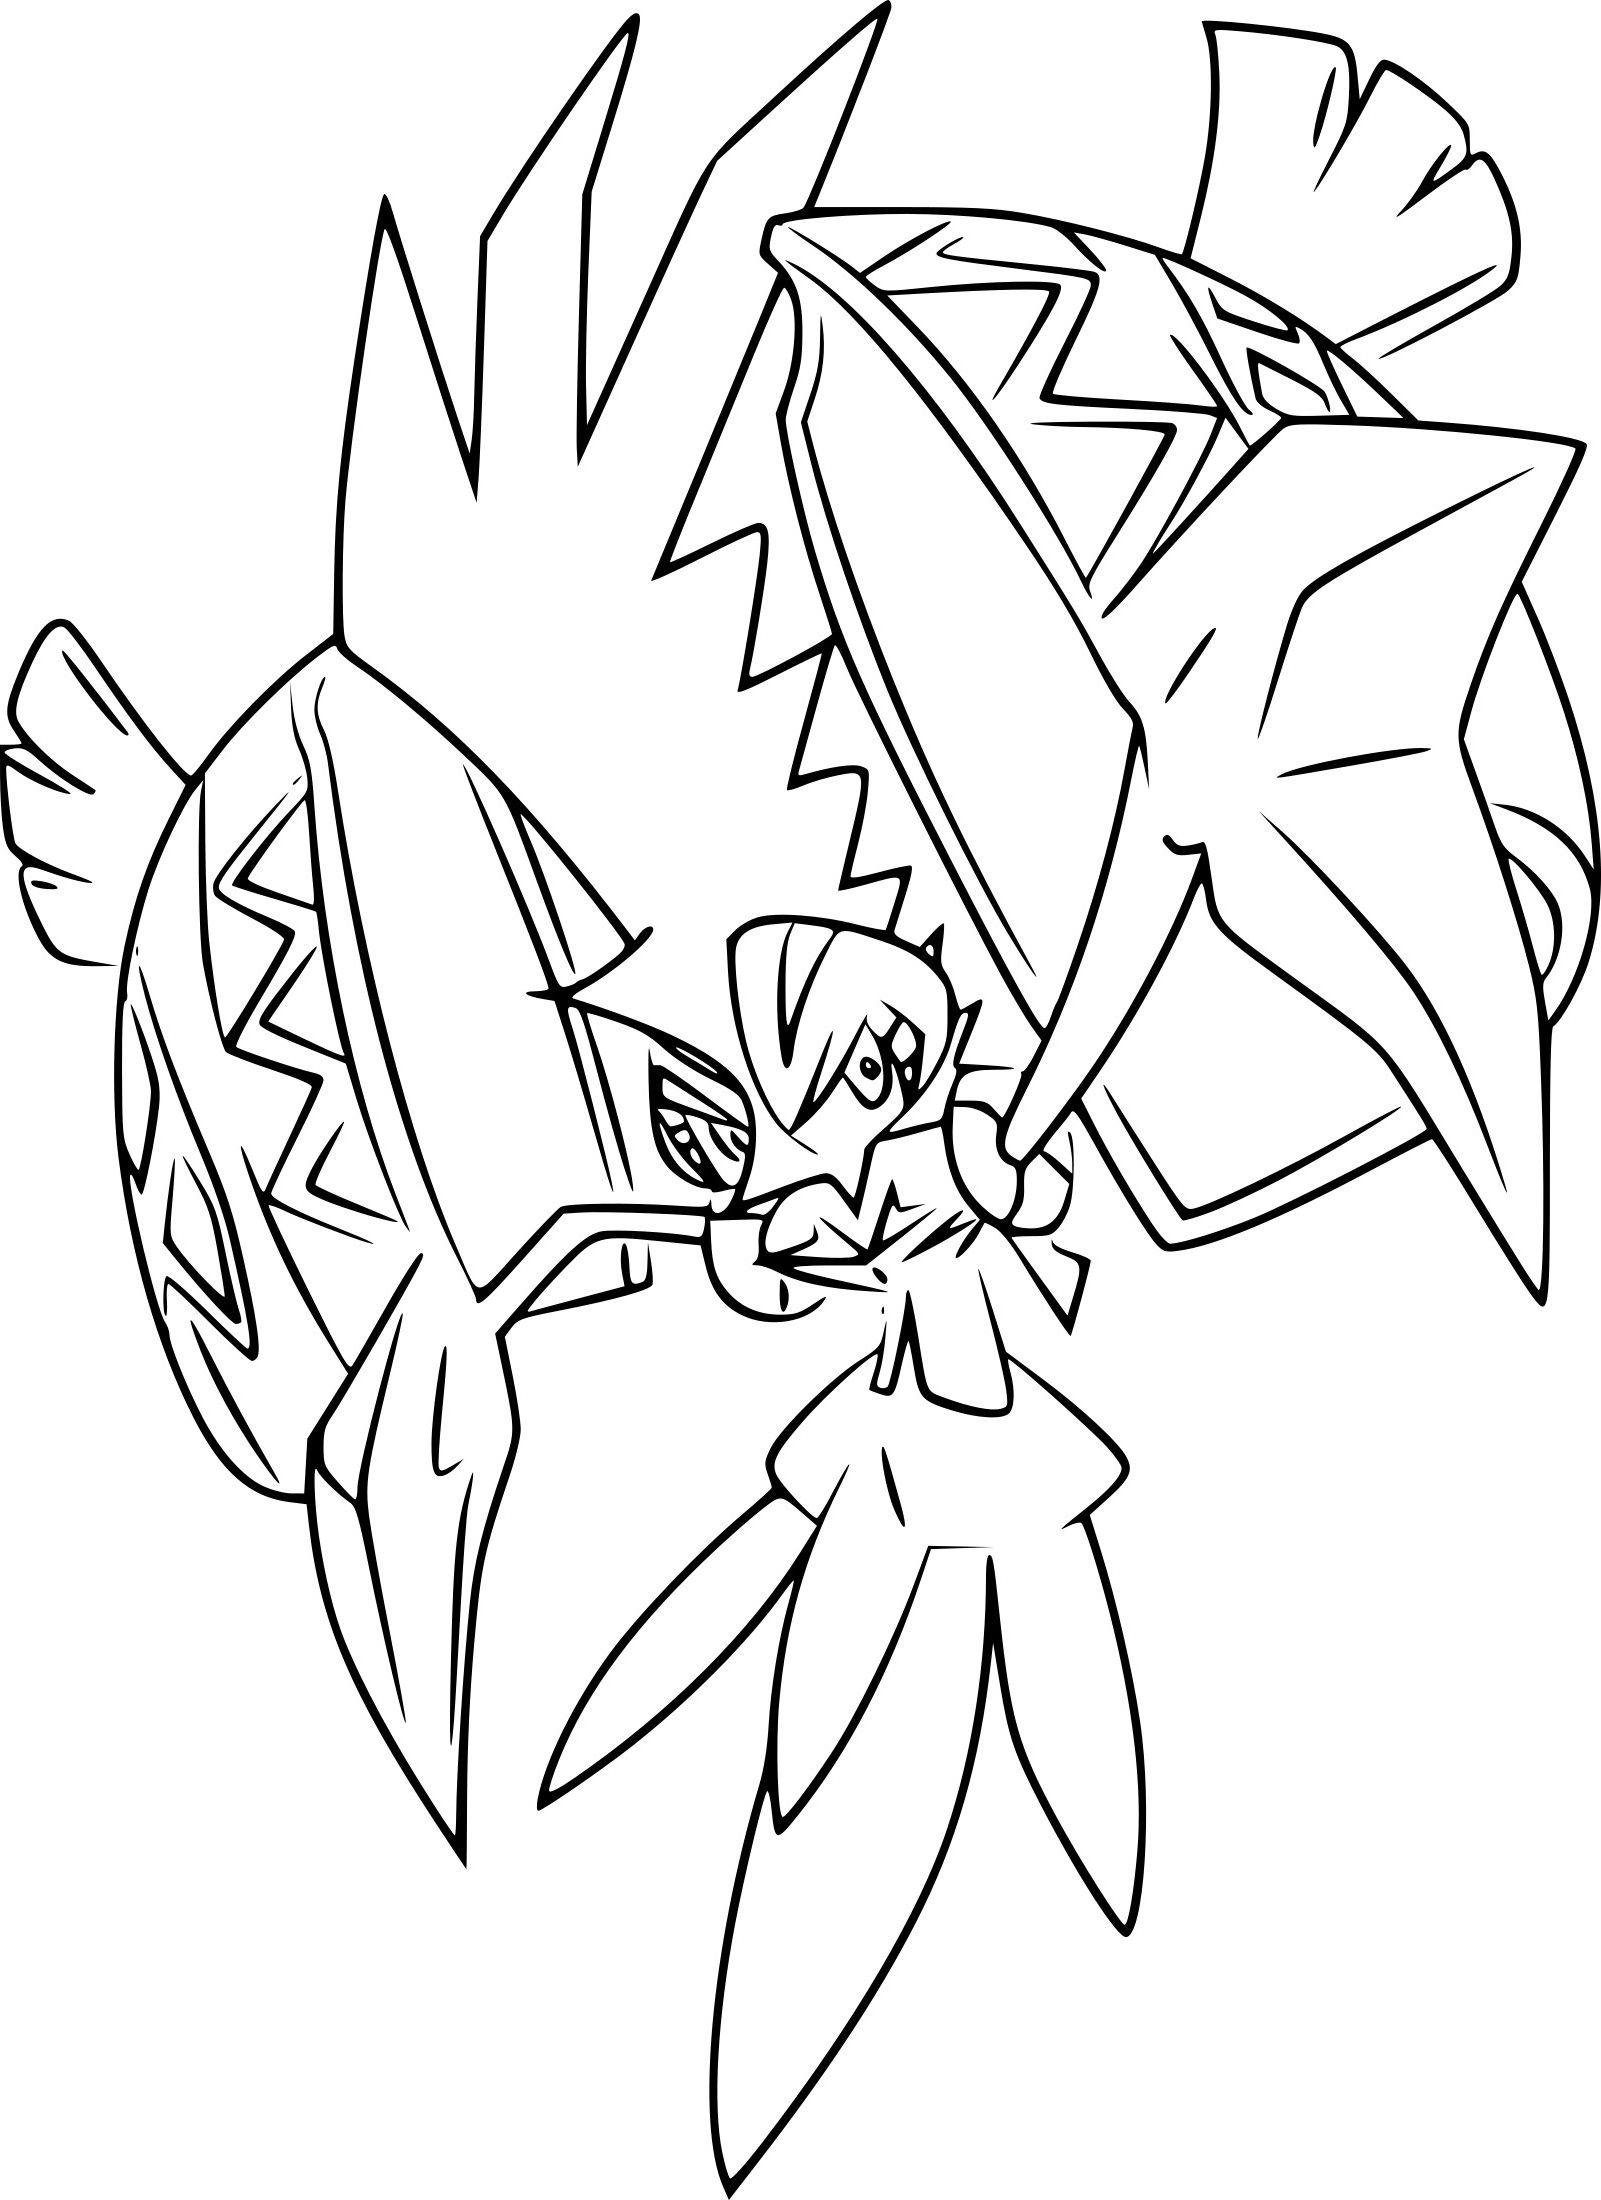 Coloriage Tokorico Pokemon A Imprimer Coloriage Pokemon